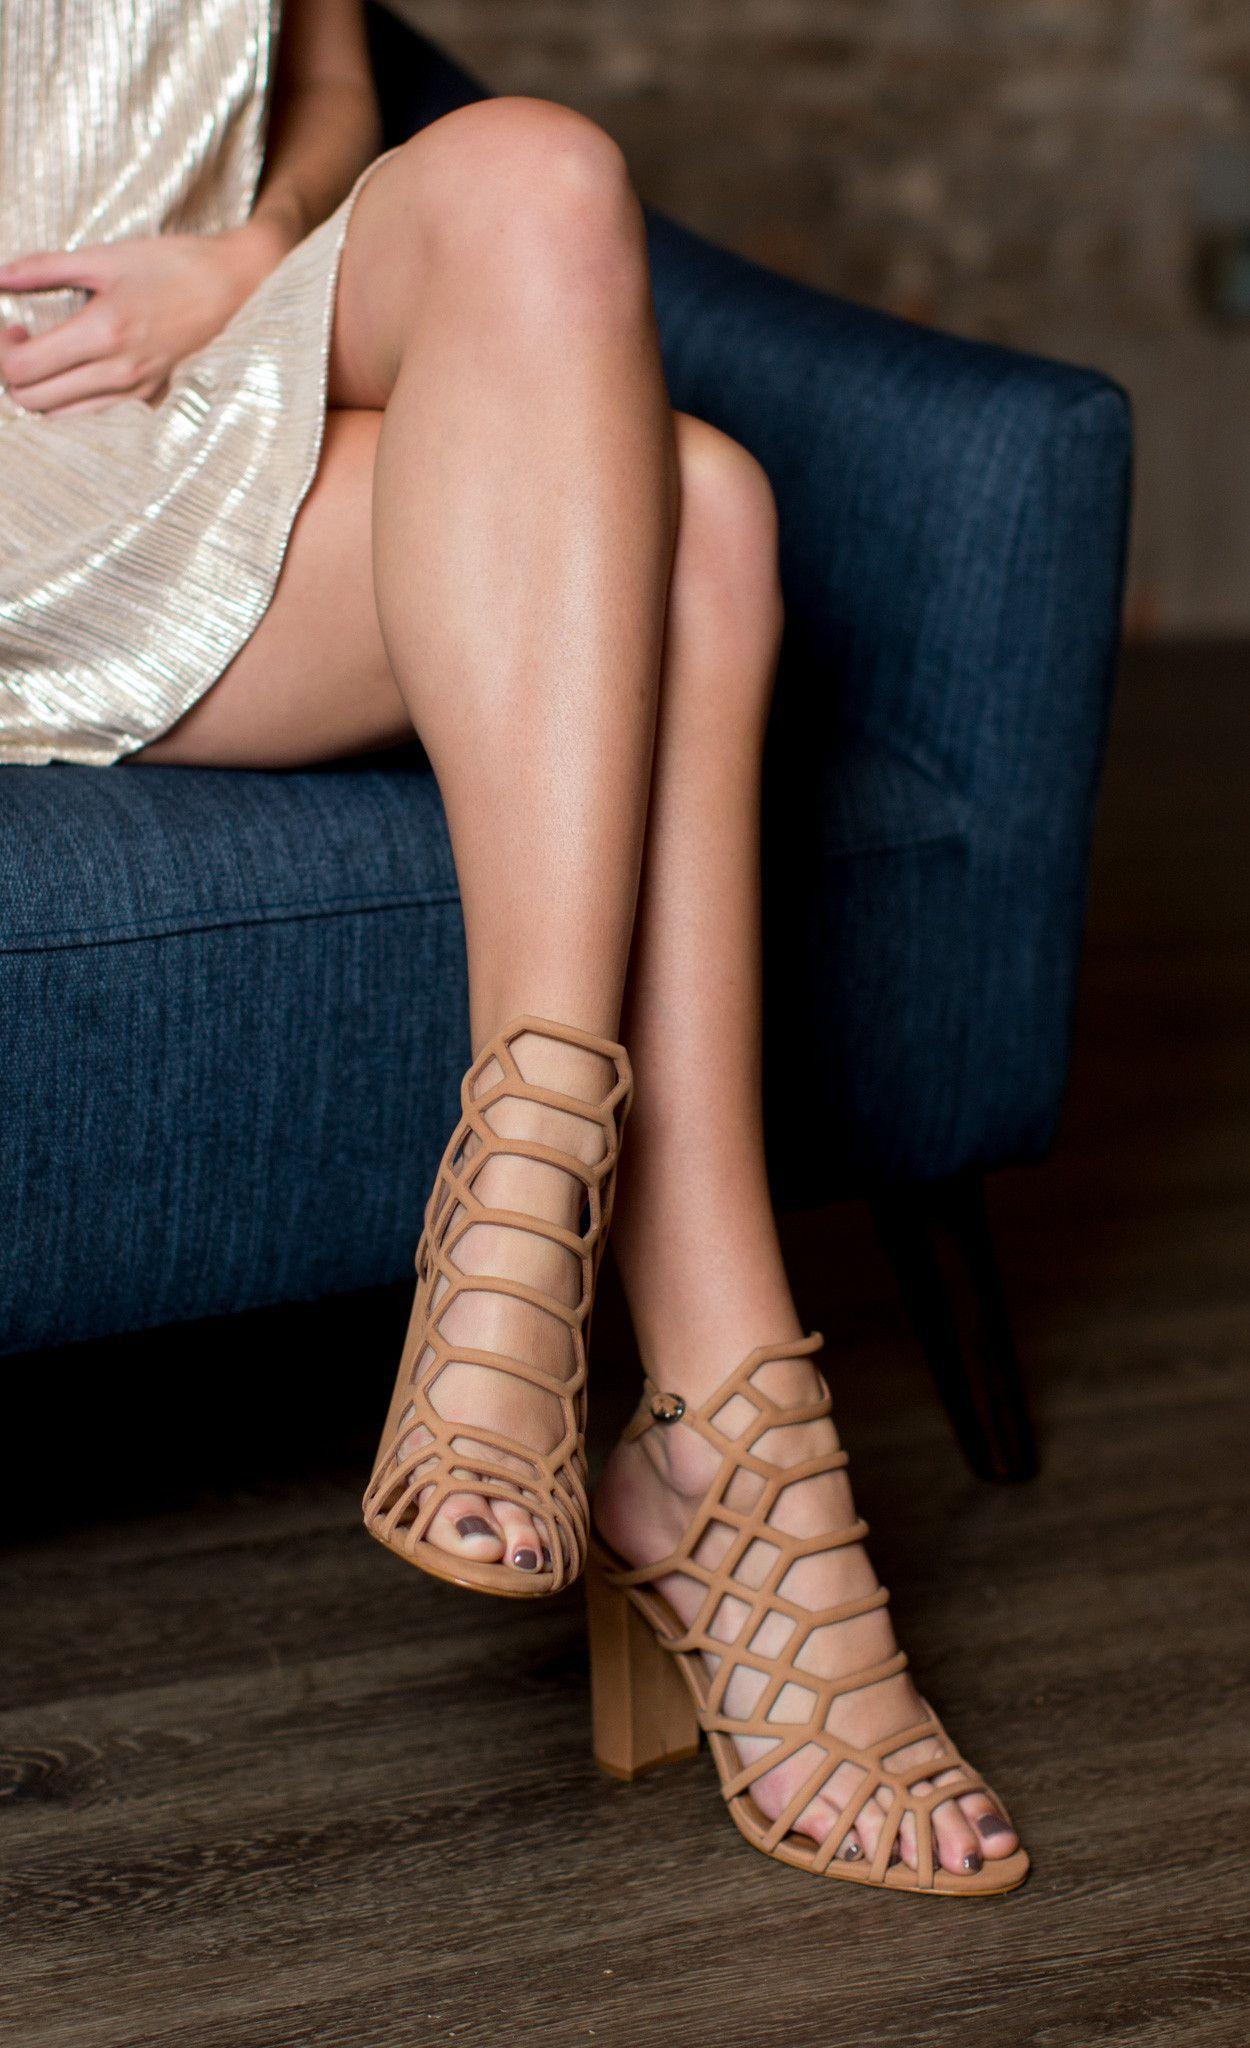 e8042892d81 Talk about shoe envy! The Steve Madden Skales Heel are back at ...